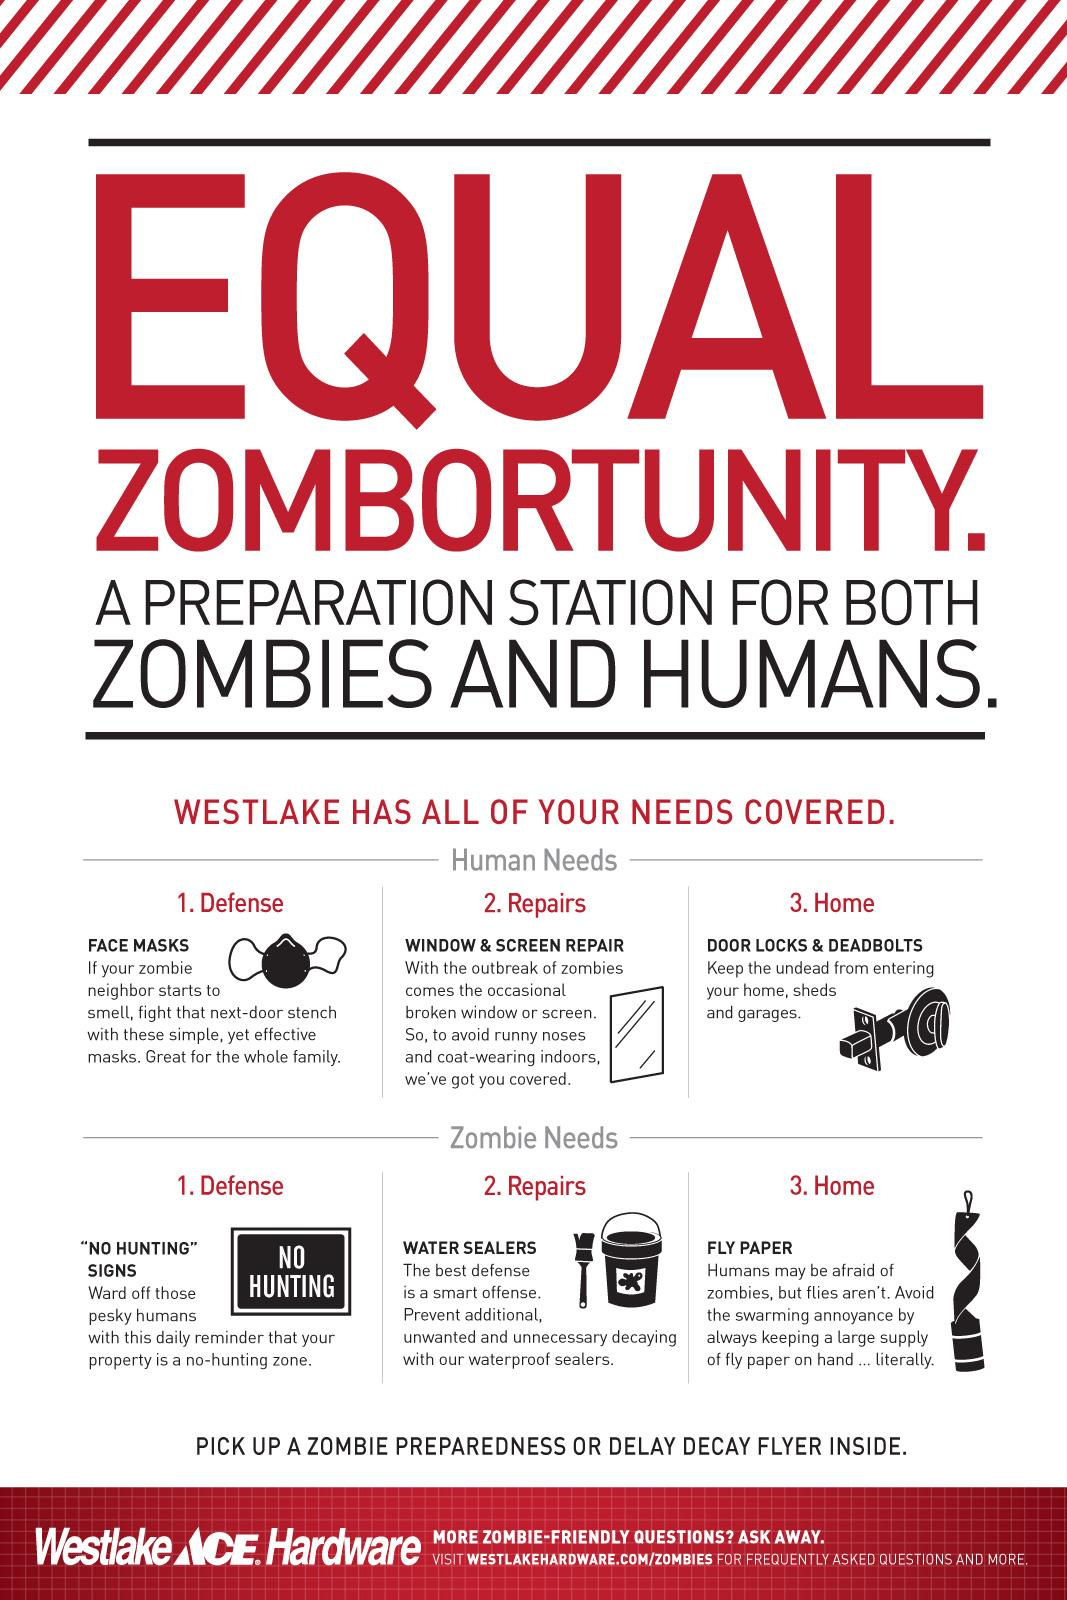 Westlake Hardware Outdoor Ad -  Zombie Preparedness, For Zombies